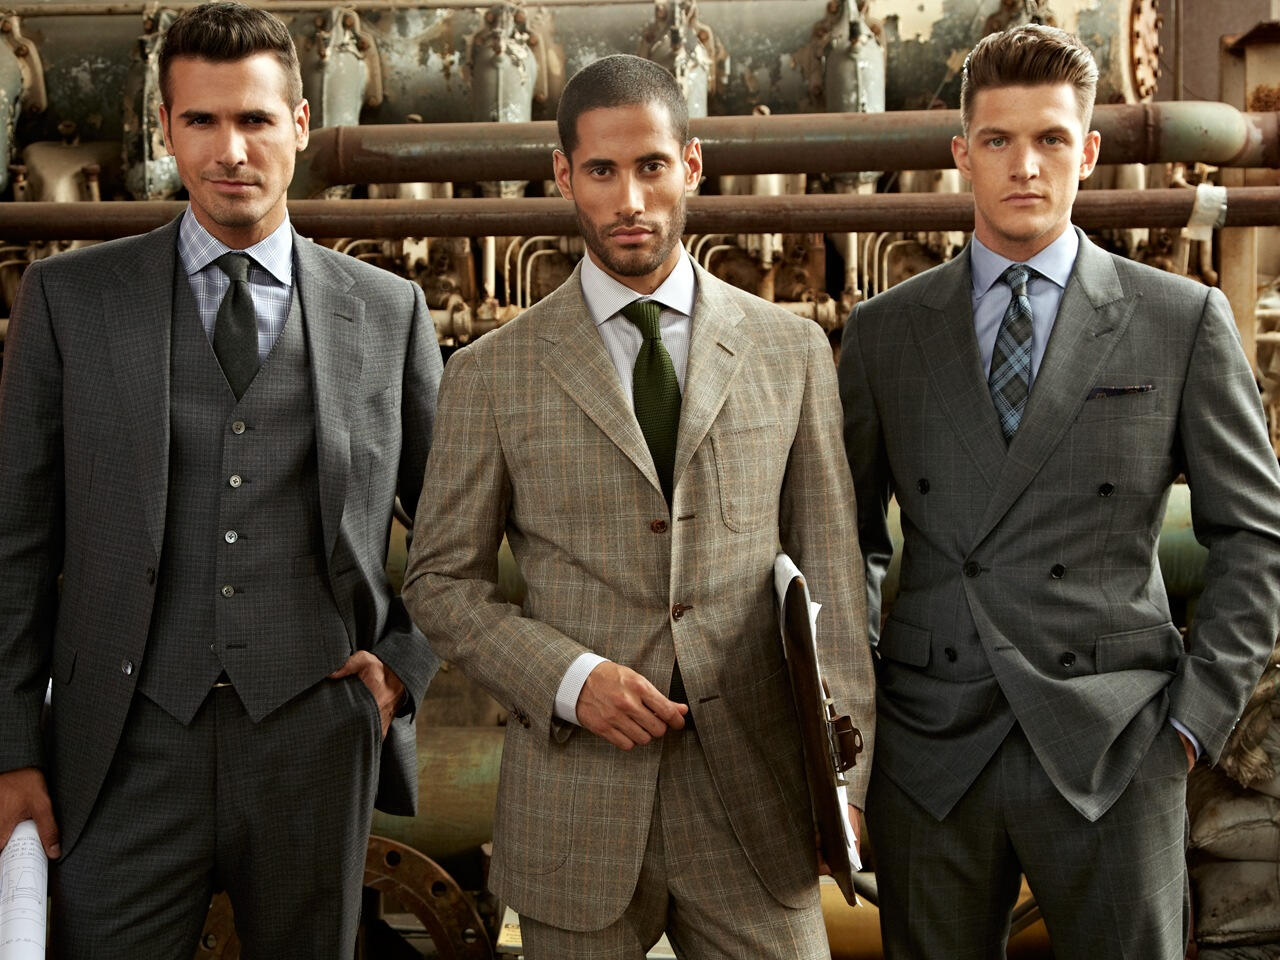 nie je oblek ako oblek